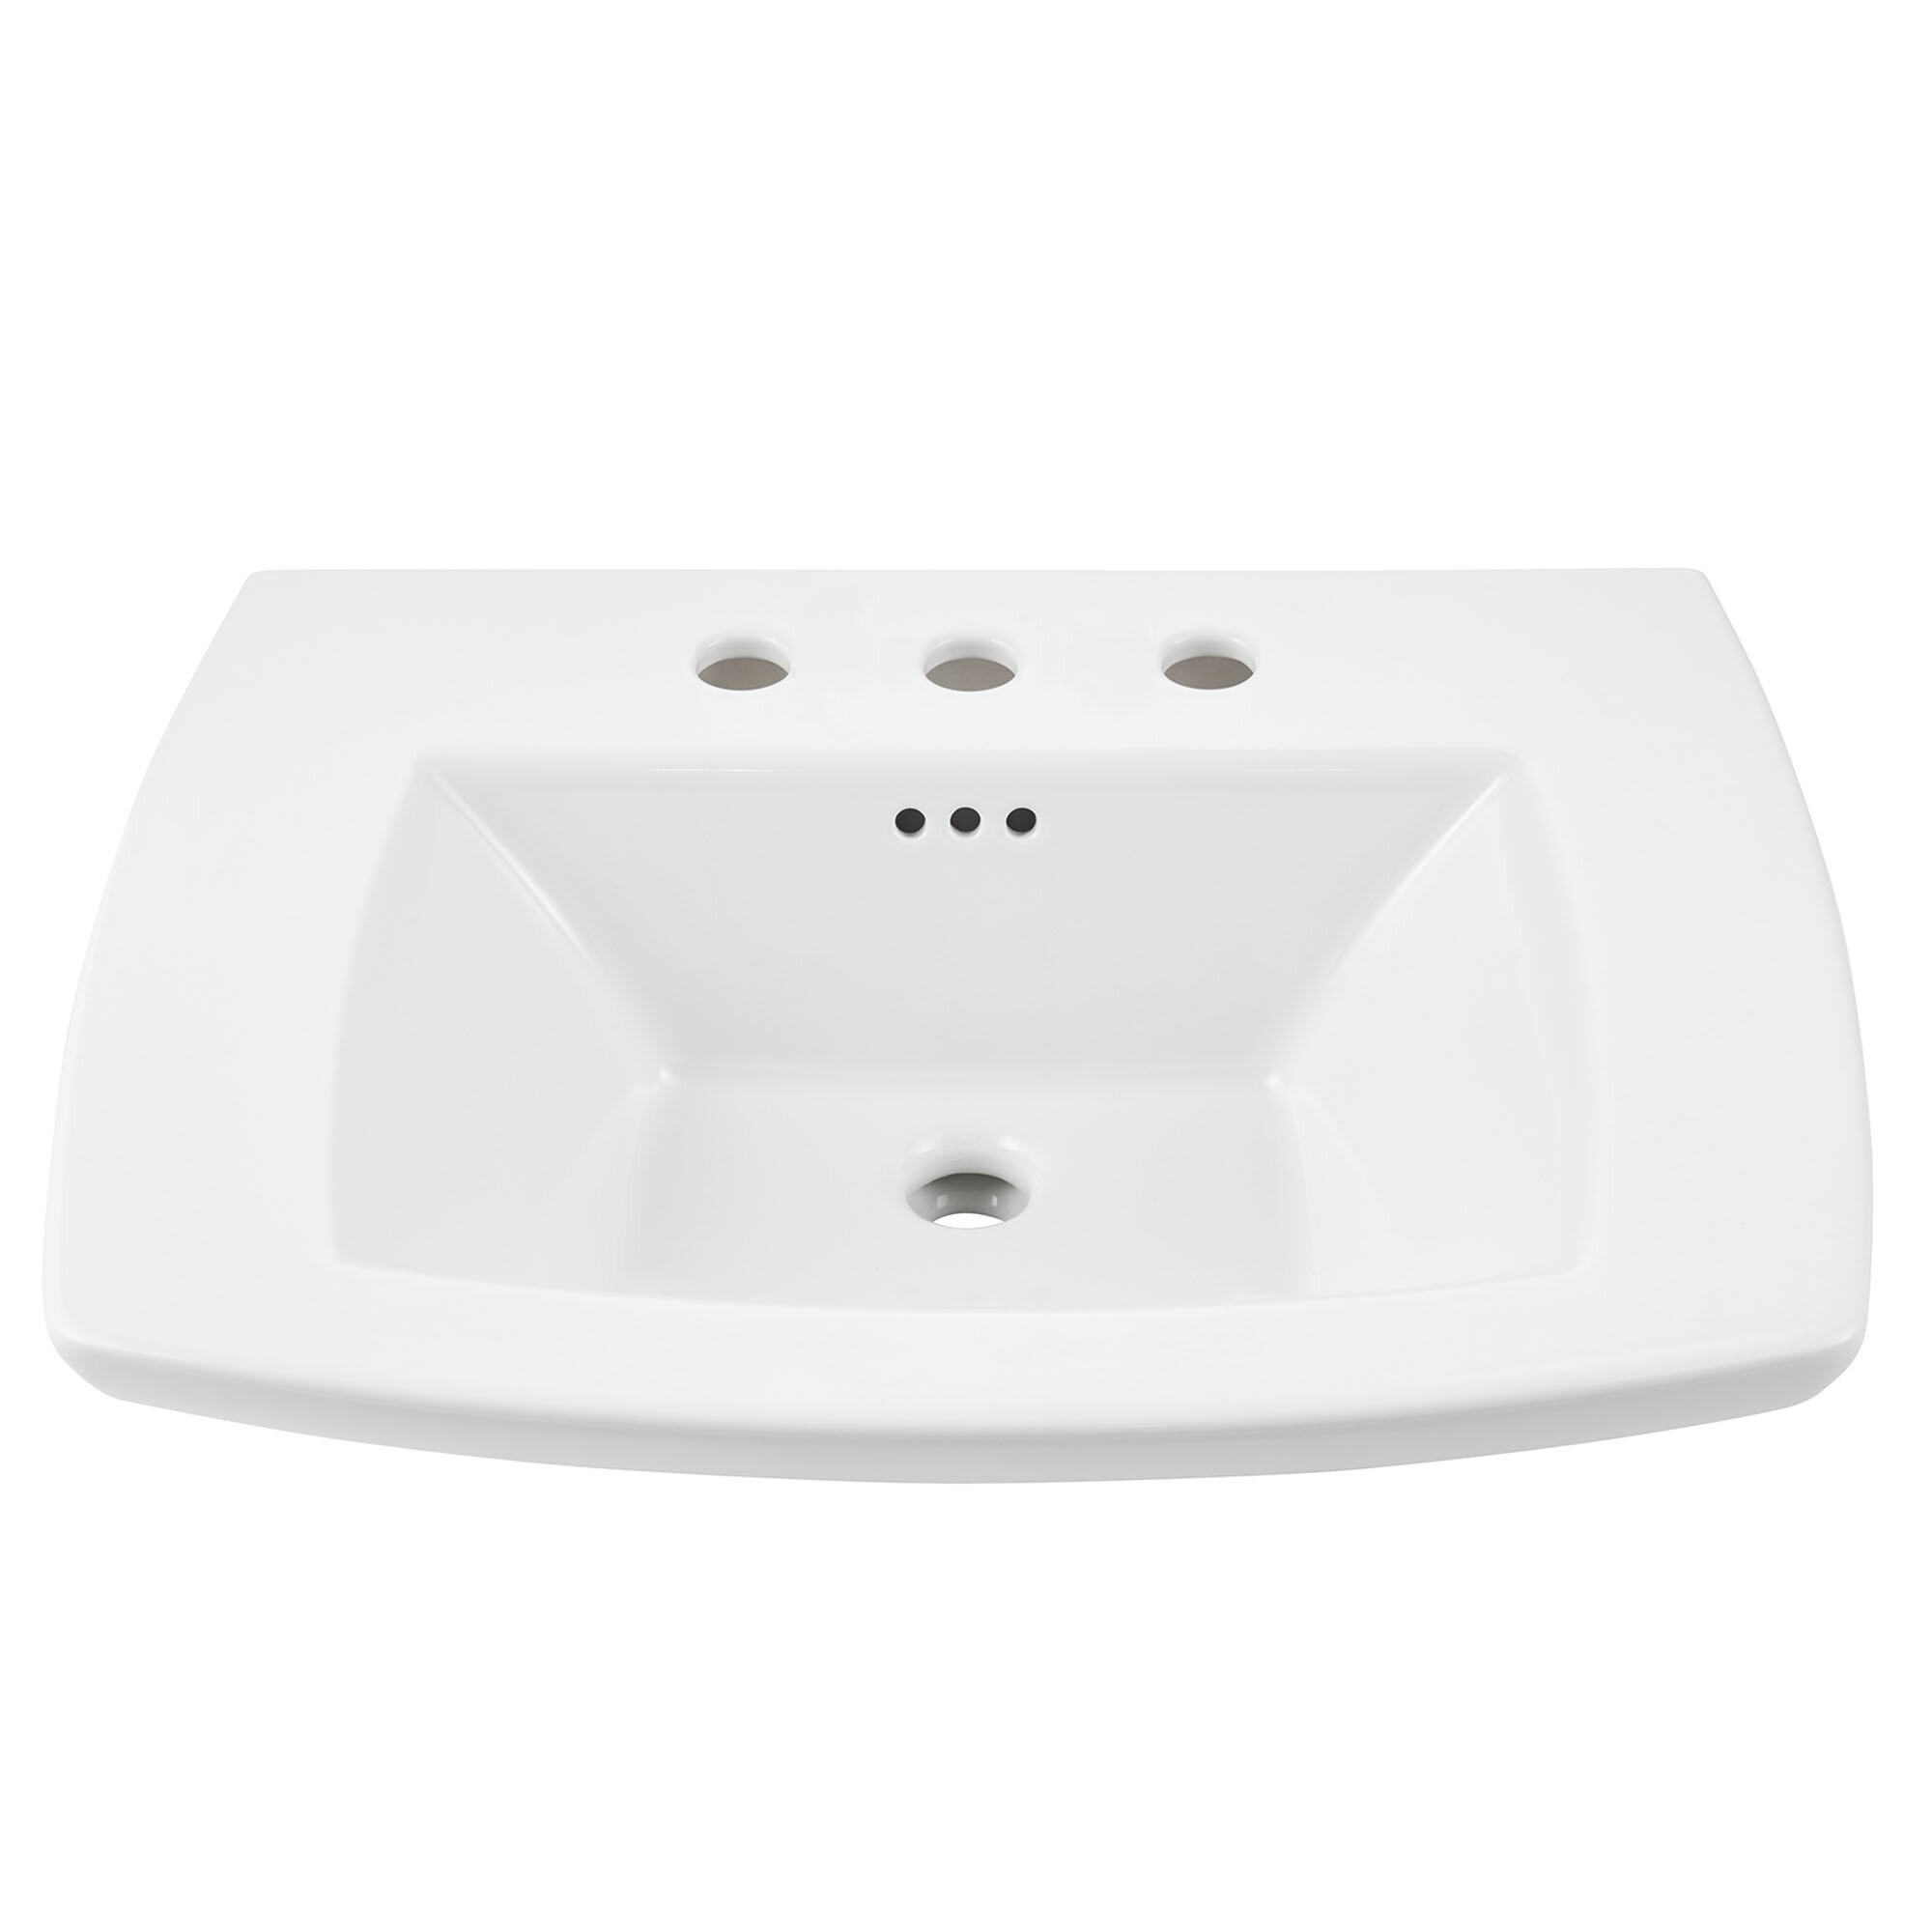 American Standard Edgemere White Ceramic Rectangular Console